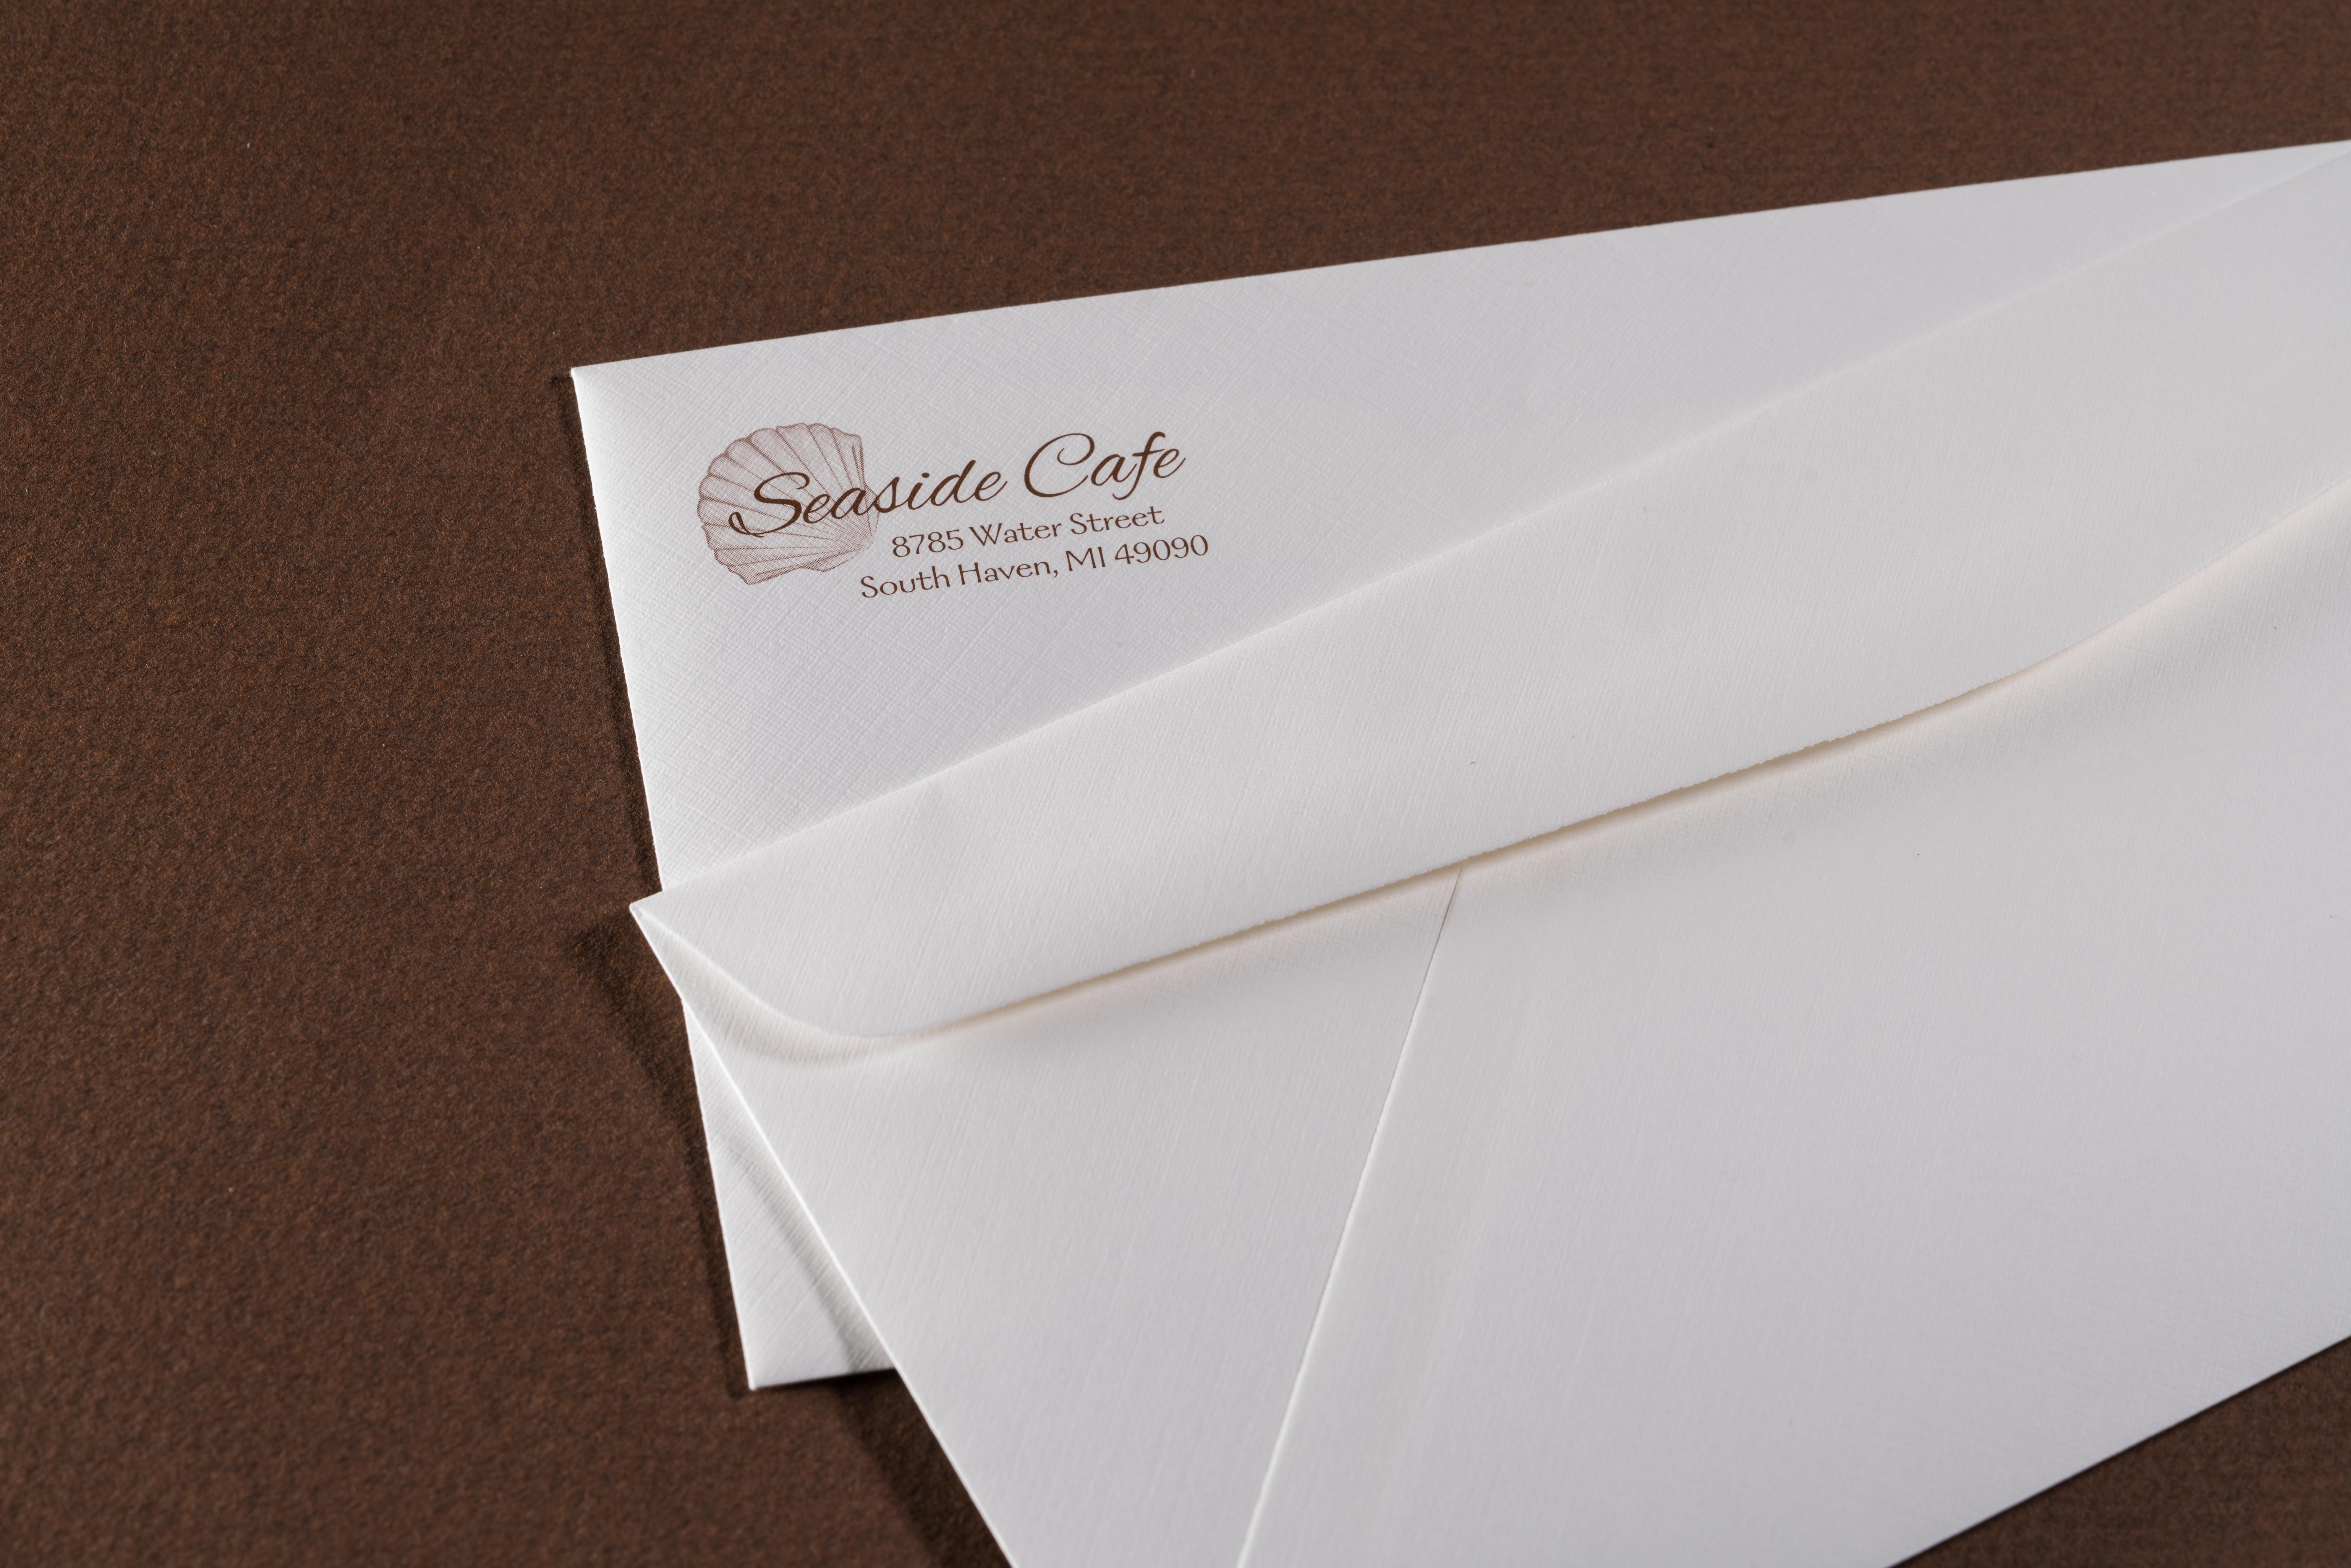 Business Cards | Custom Business Cards & Card Printing | Custom ...